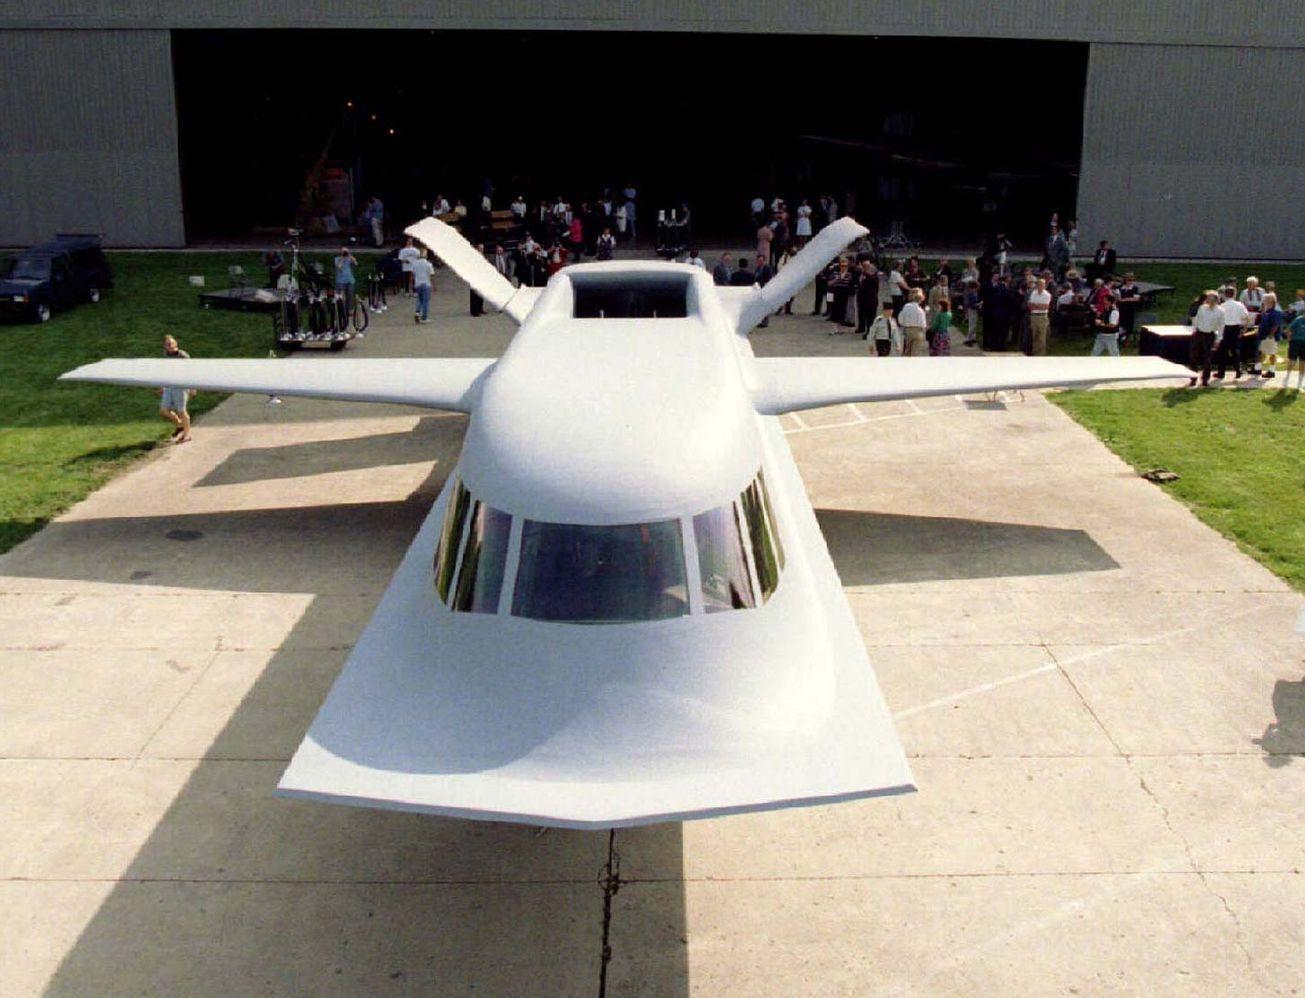 This is Tacit Blue—the World's Weirdest Stealth Plane